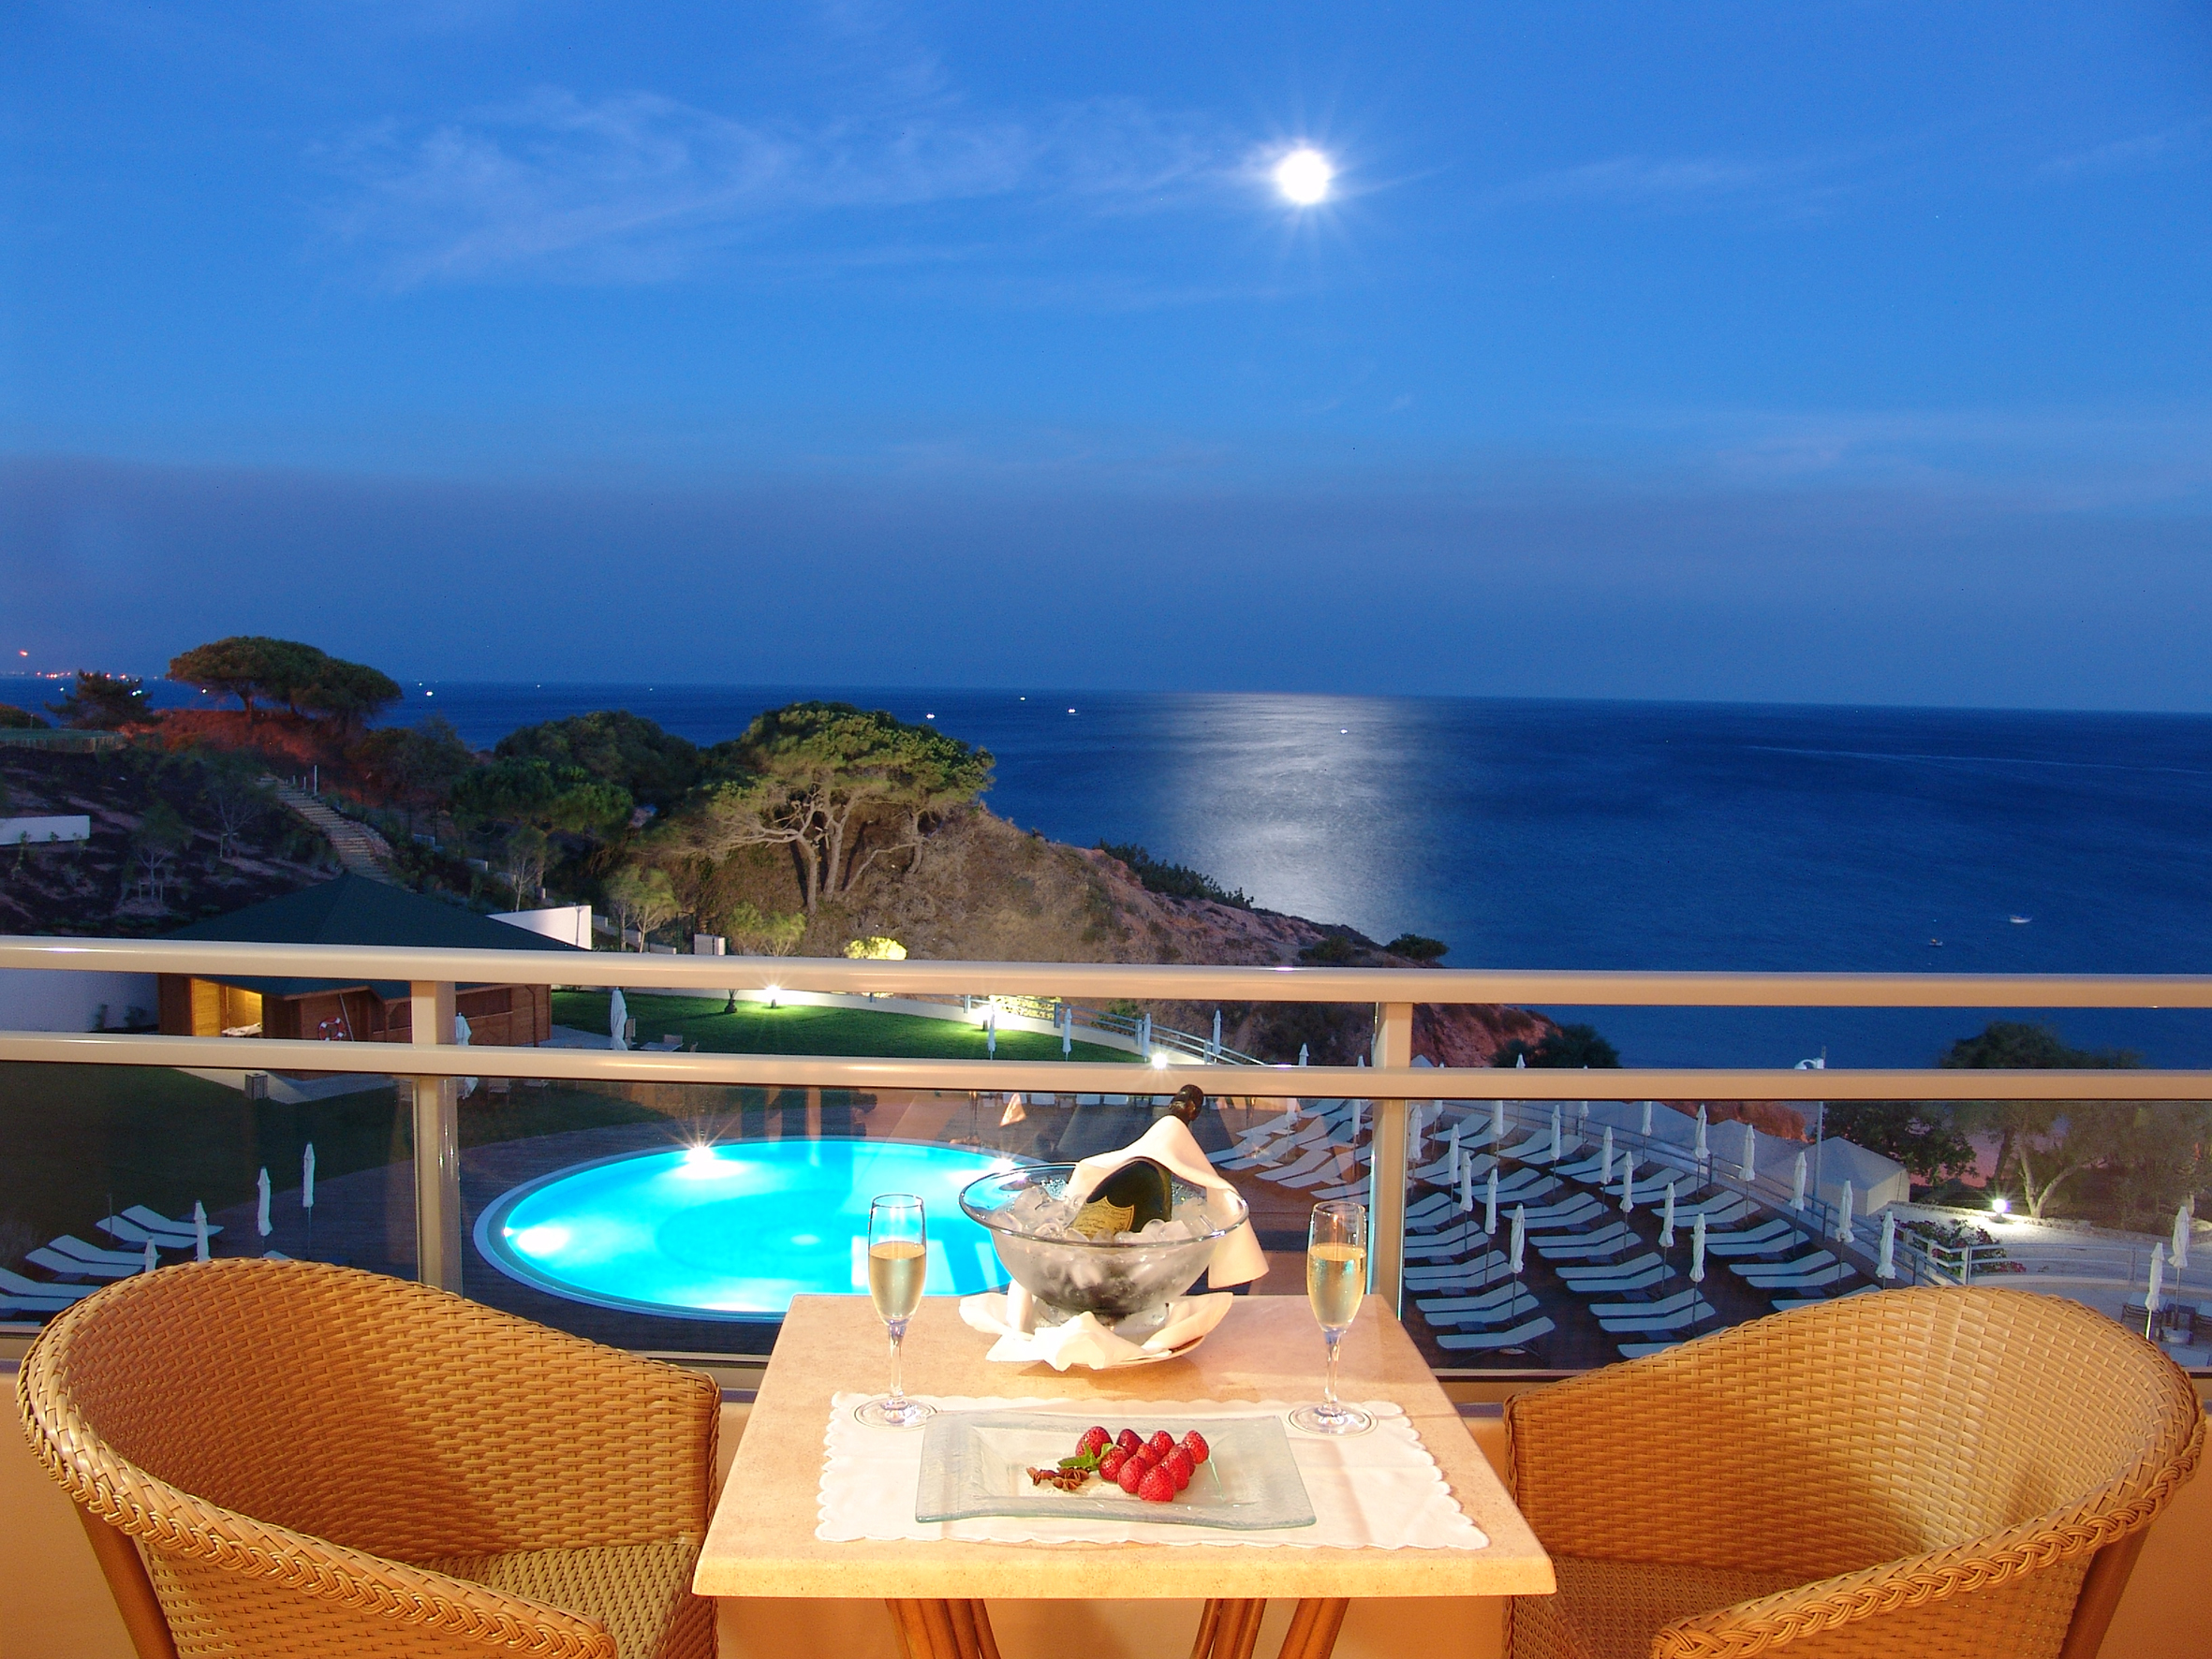 Горизонт, вечер, море, вид, терраса, отель, балкон картинки .